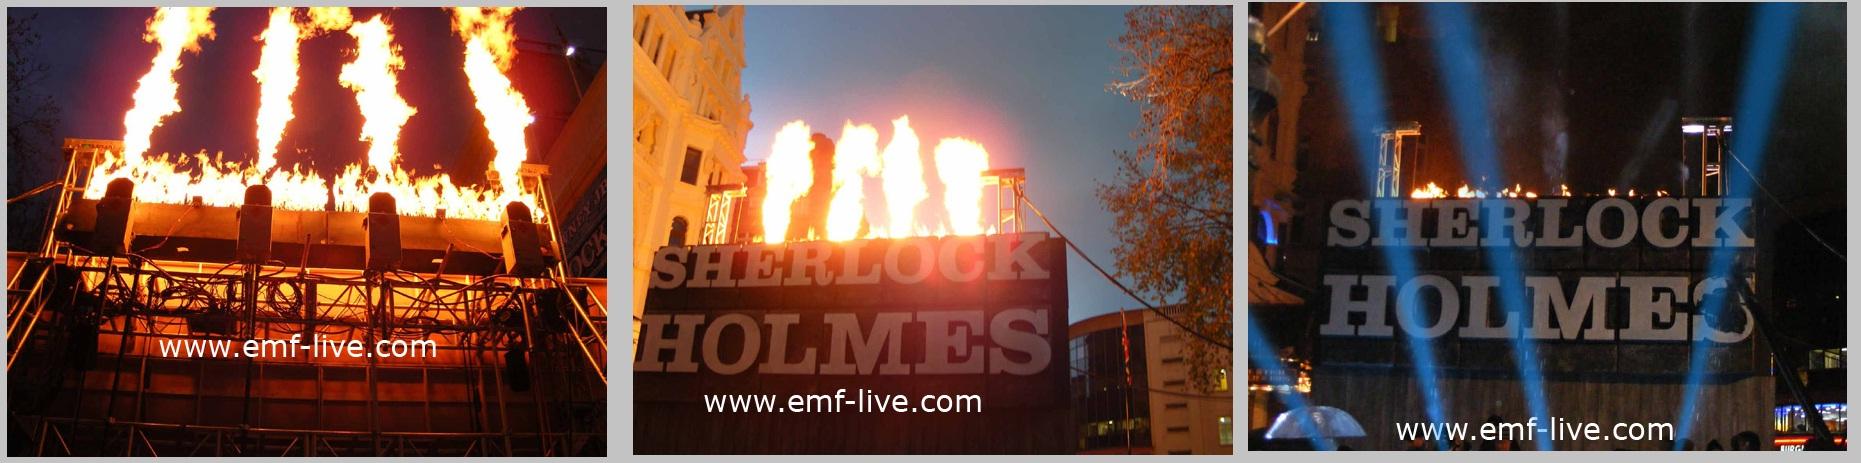 Flame effects for Sherlock Holmes London Film Premiere!